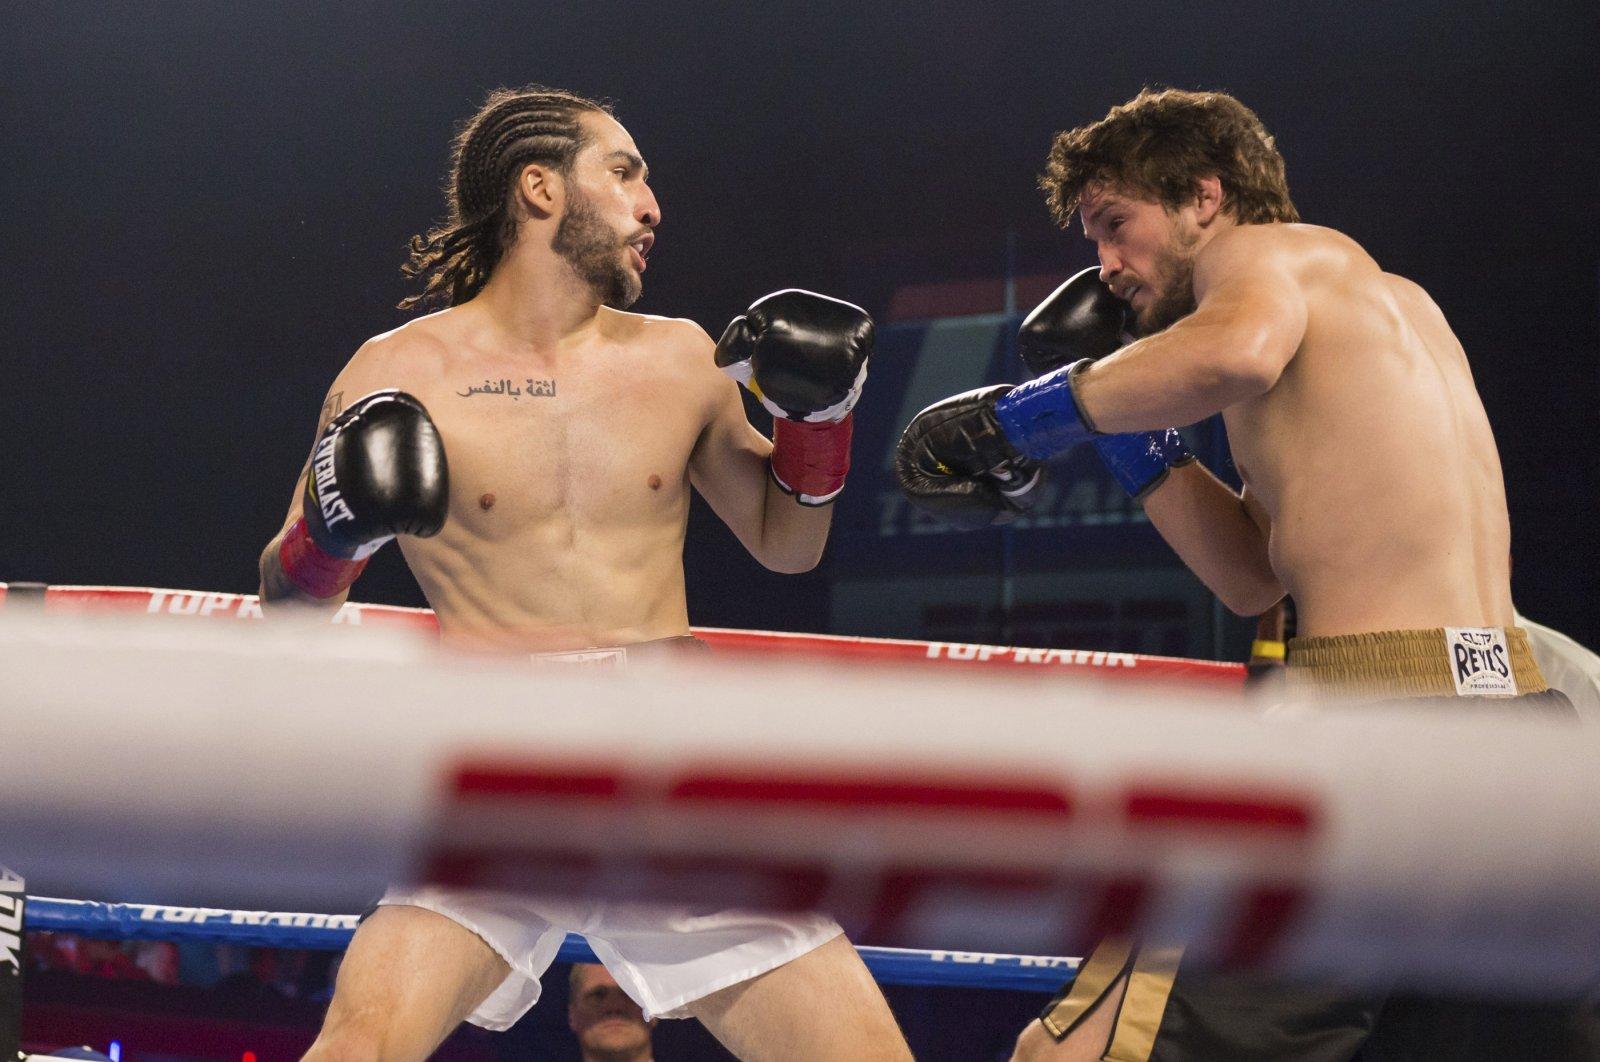 Nico Ali Walsh (L) faces Jordan Weeks during a middleweight boxing bout, Tulsa, Oklahoma, U.S., Aug. 14, 2021. (AP Photo)